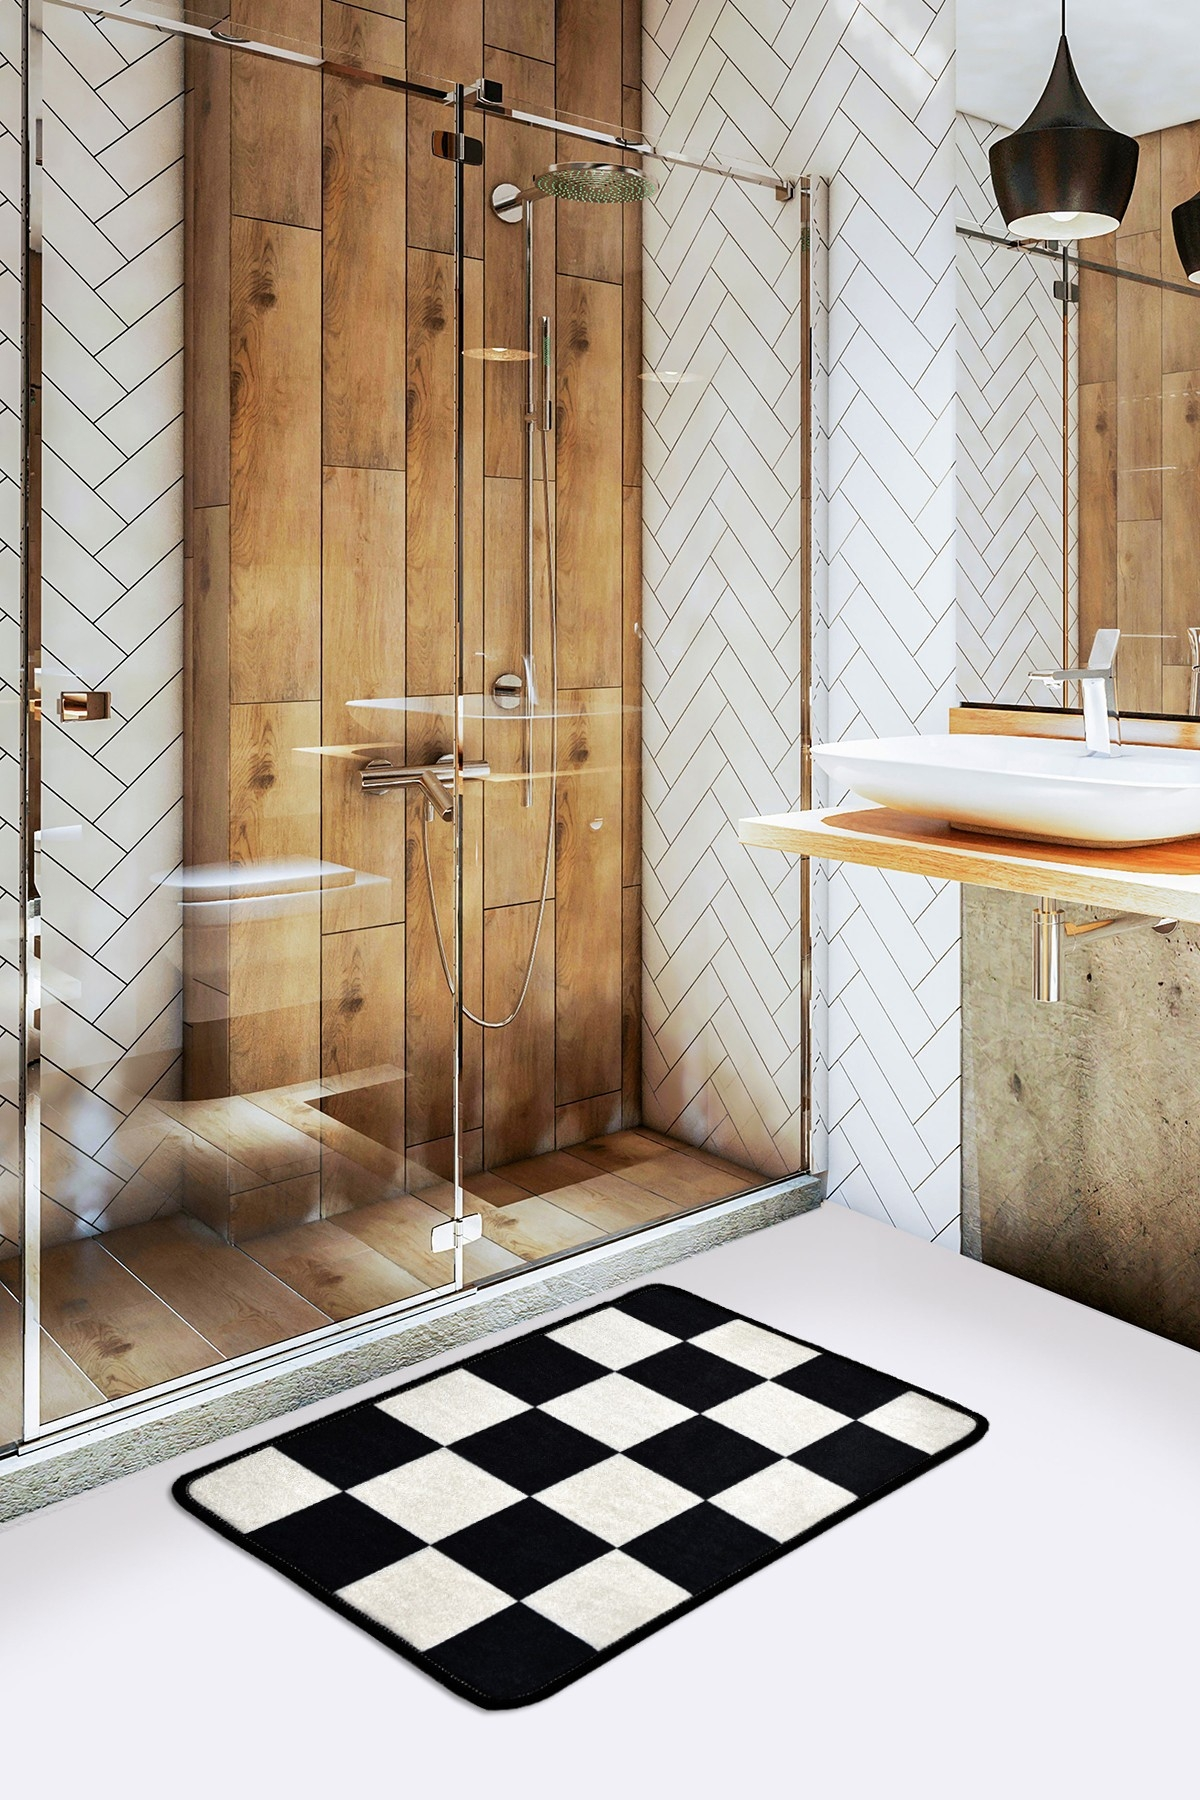 Covoras pentru baie Dama Alb / Negru, 40 x 60 cm poza